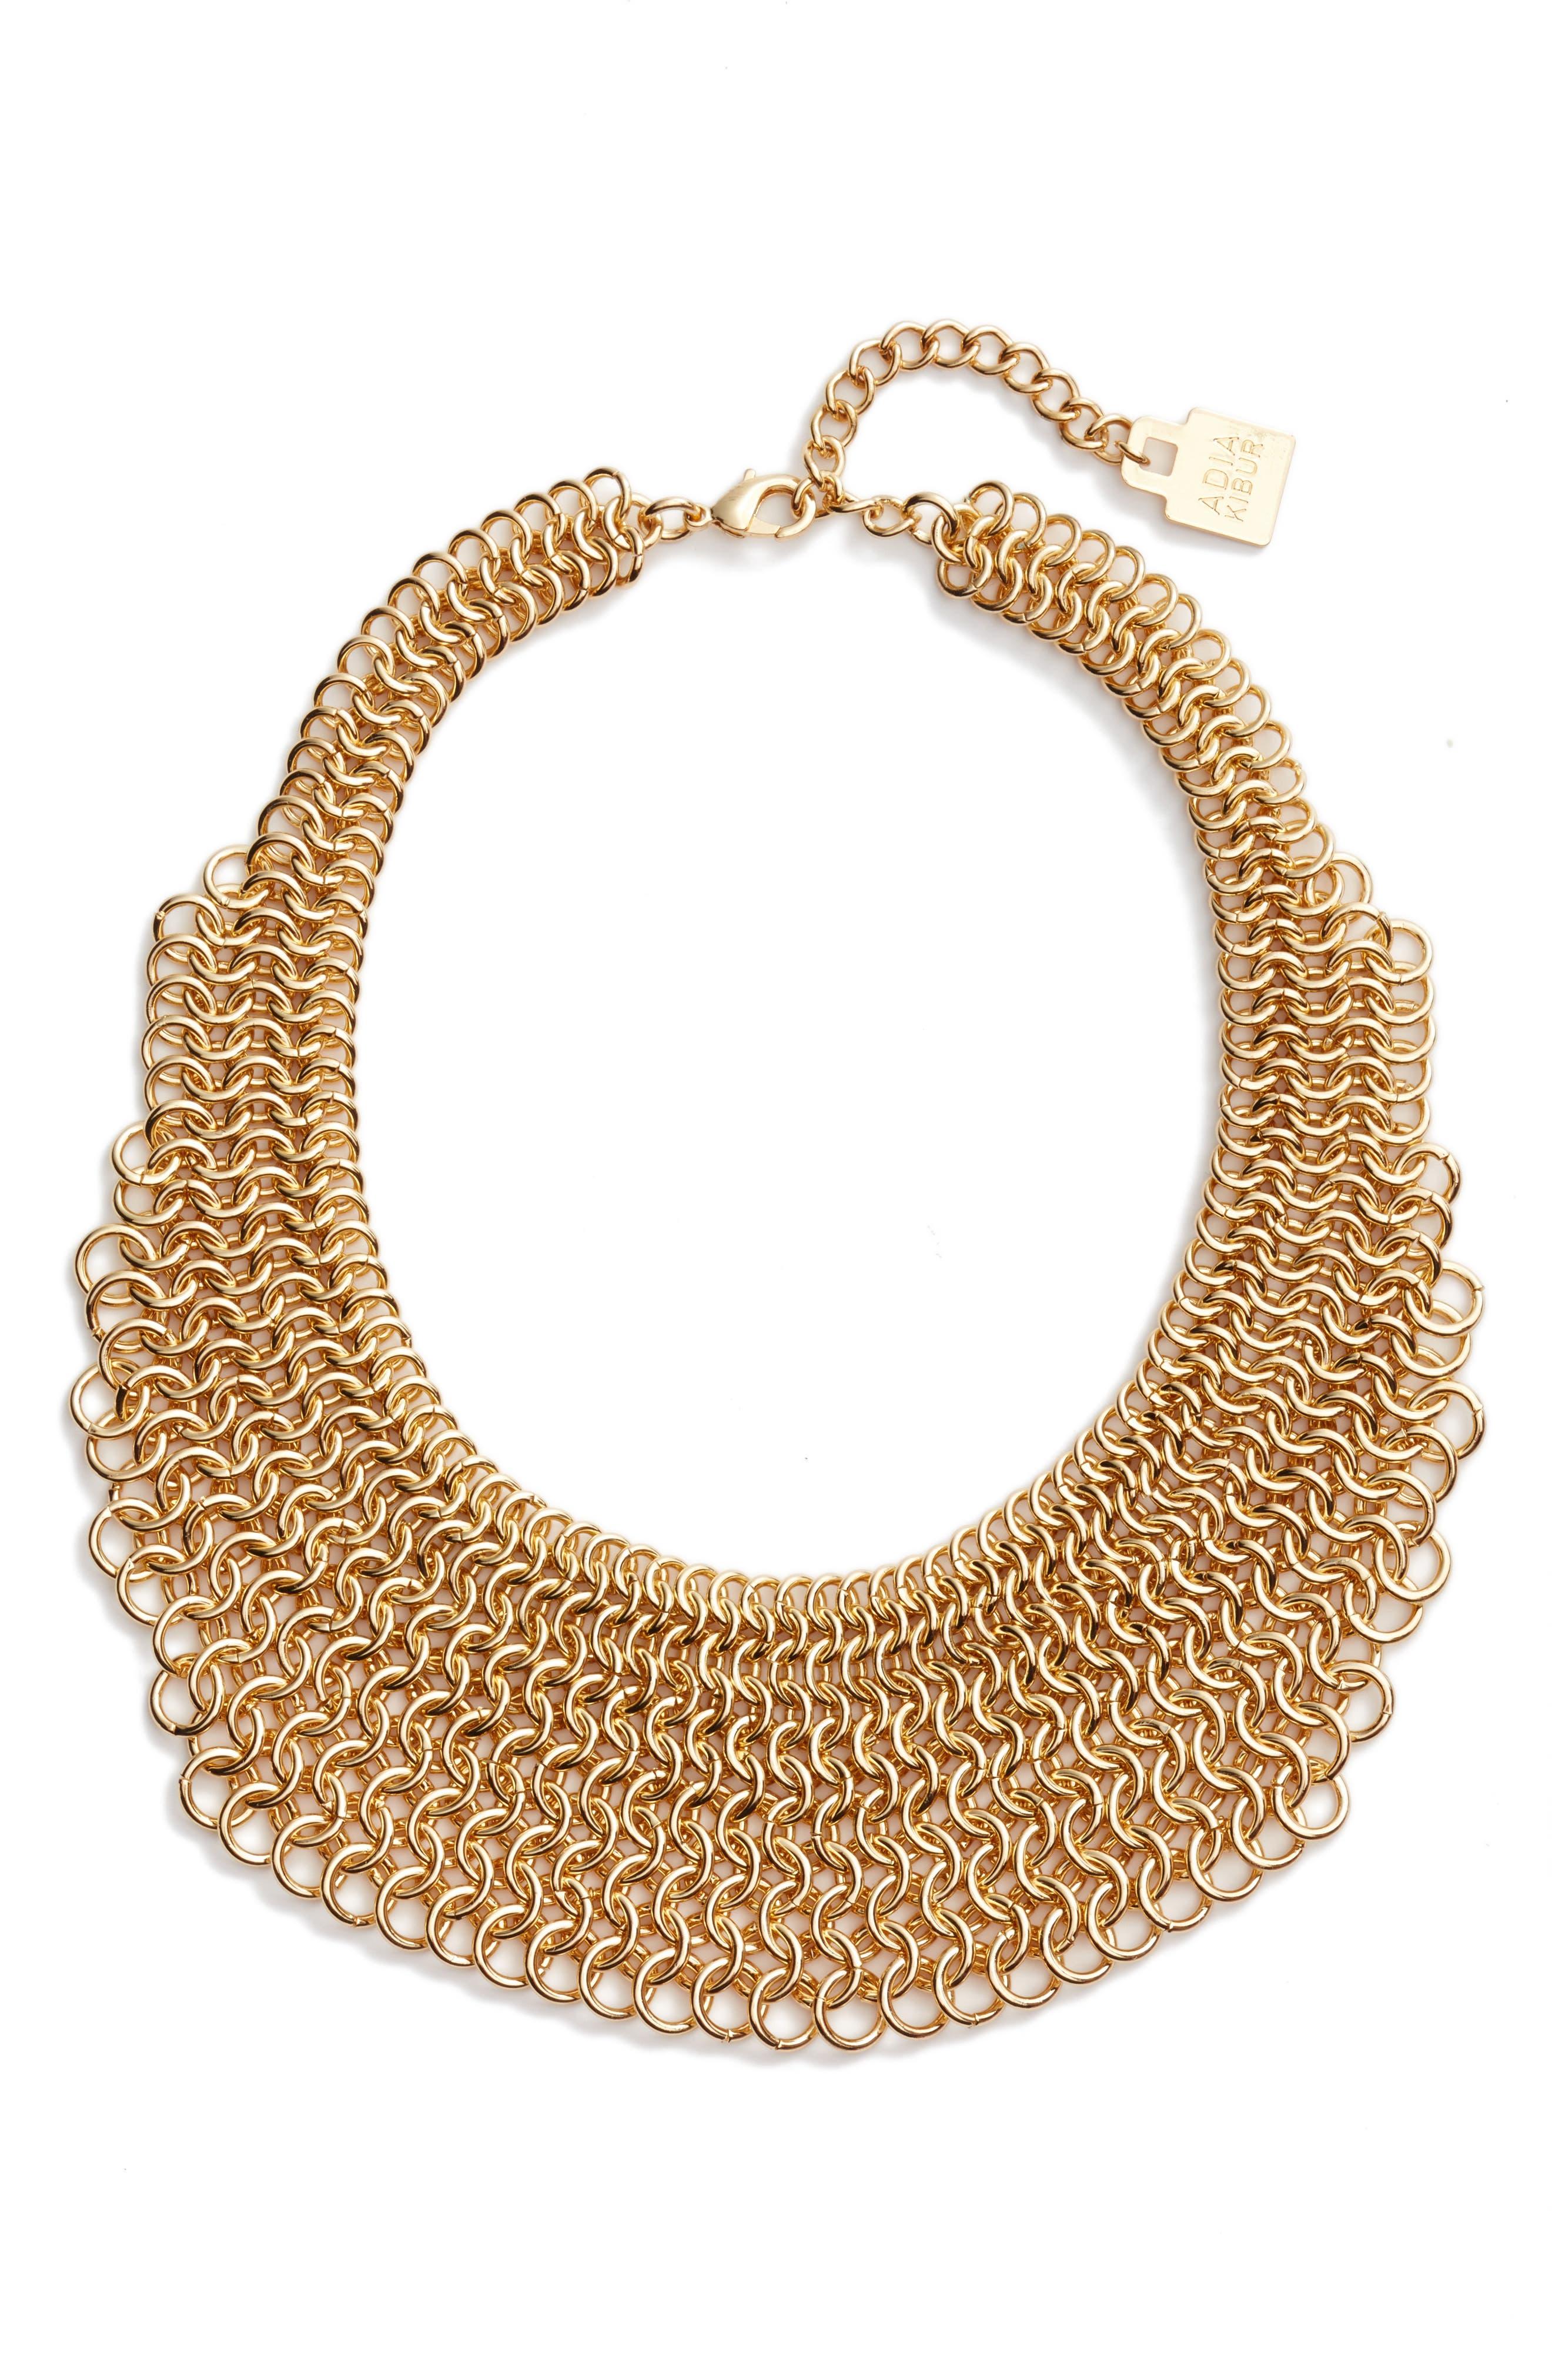 Adia Kibur Linked Circle Statement Bib Necklace